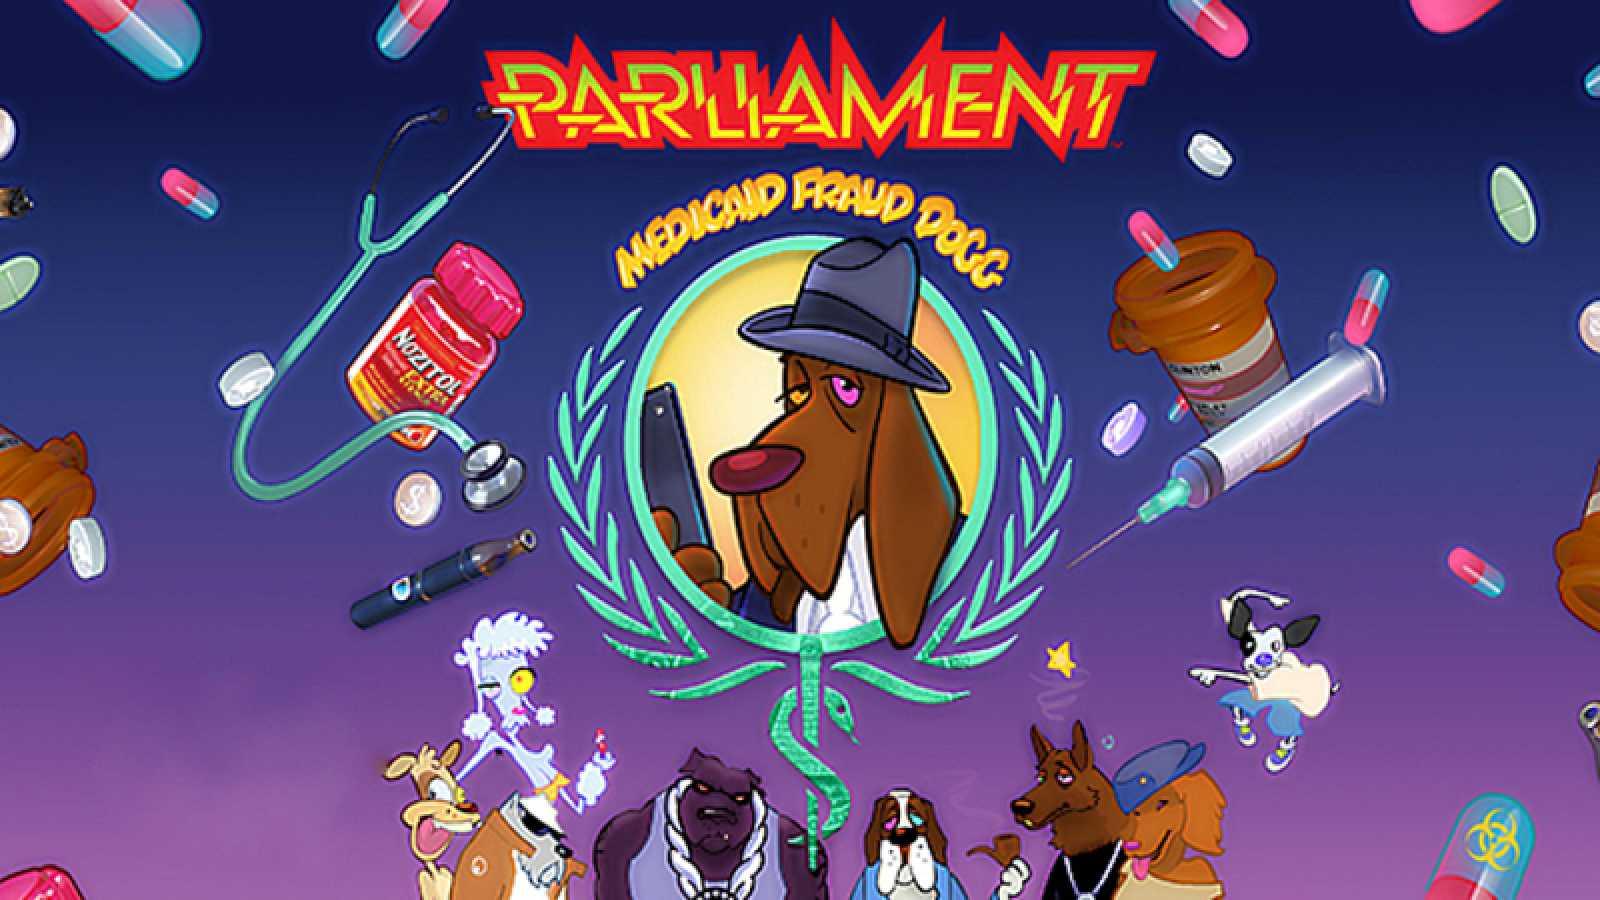 Próxima parada - Parliament & Boz Scaggs y Sam Fender - 26/10/20 - escuchar ahora